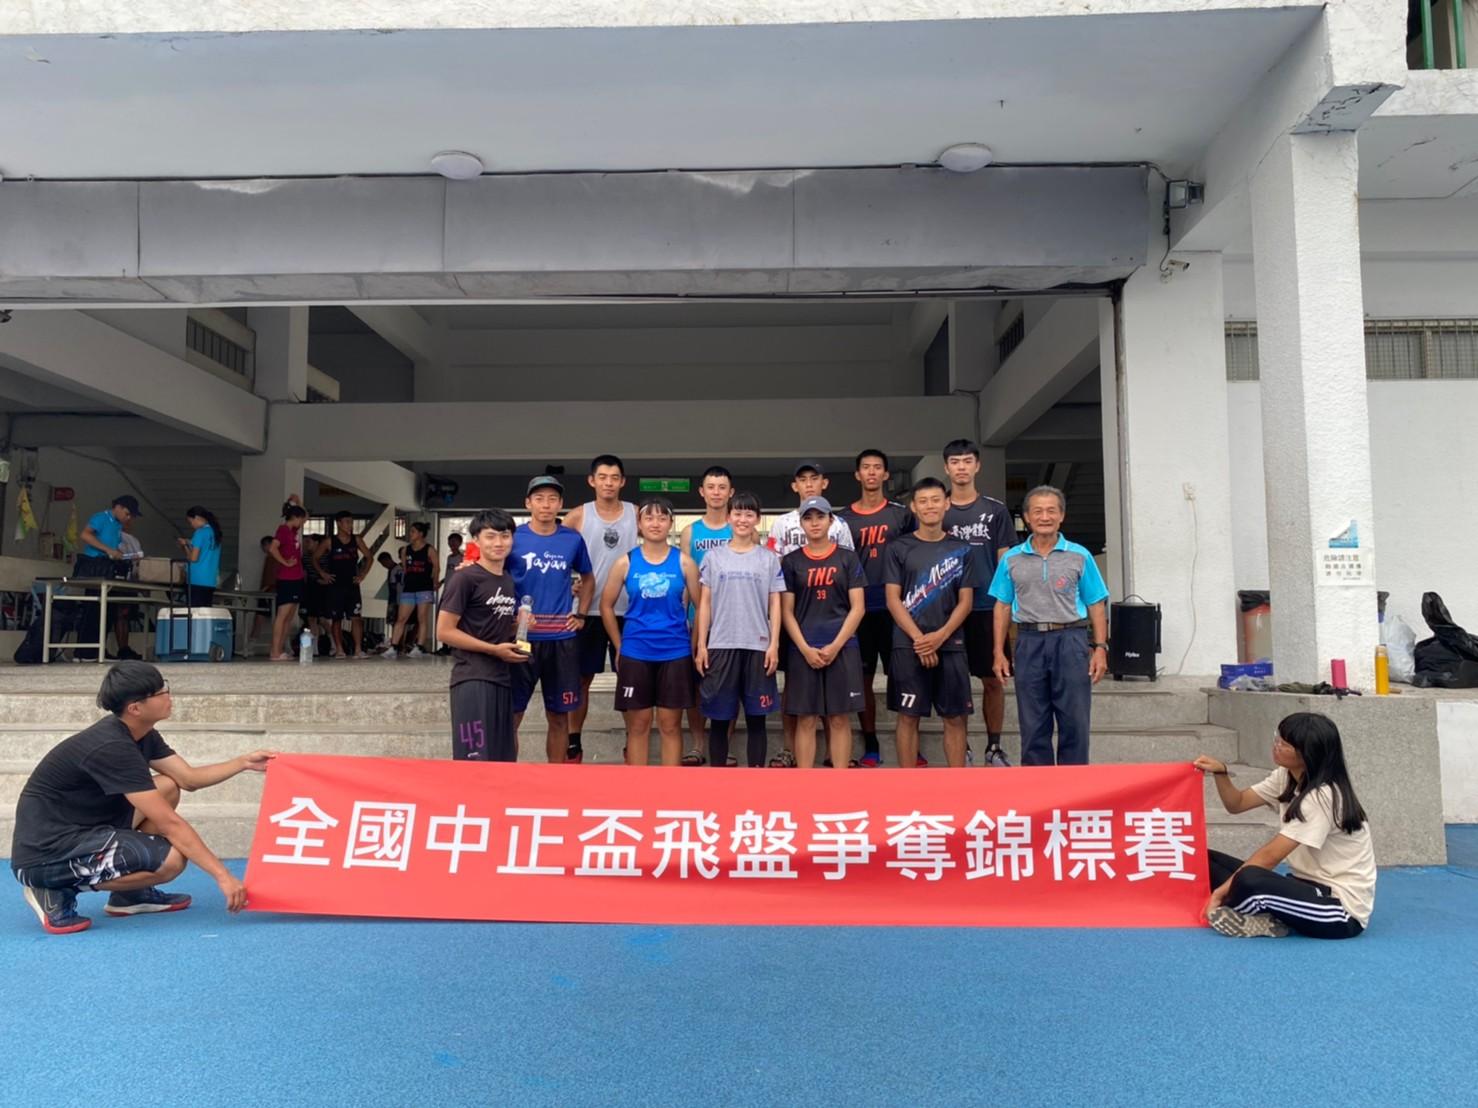 中華民國飛盤協會 Chinese Taipei Flying Disc Association